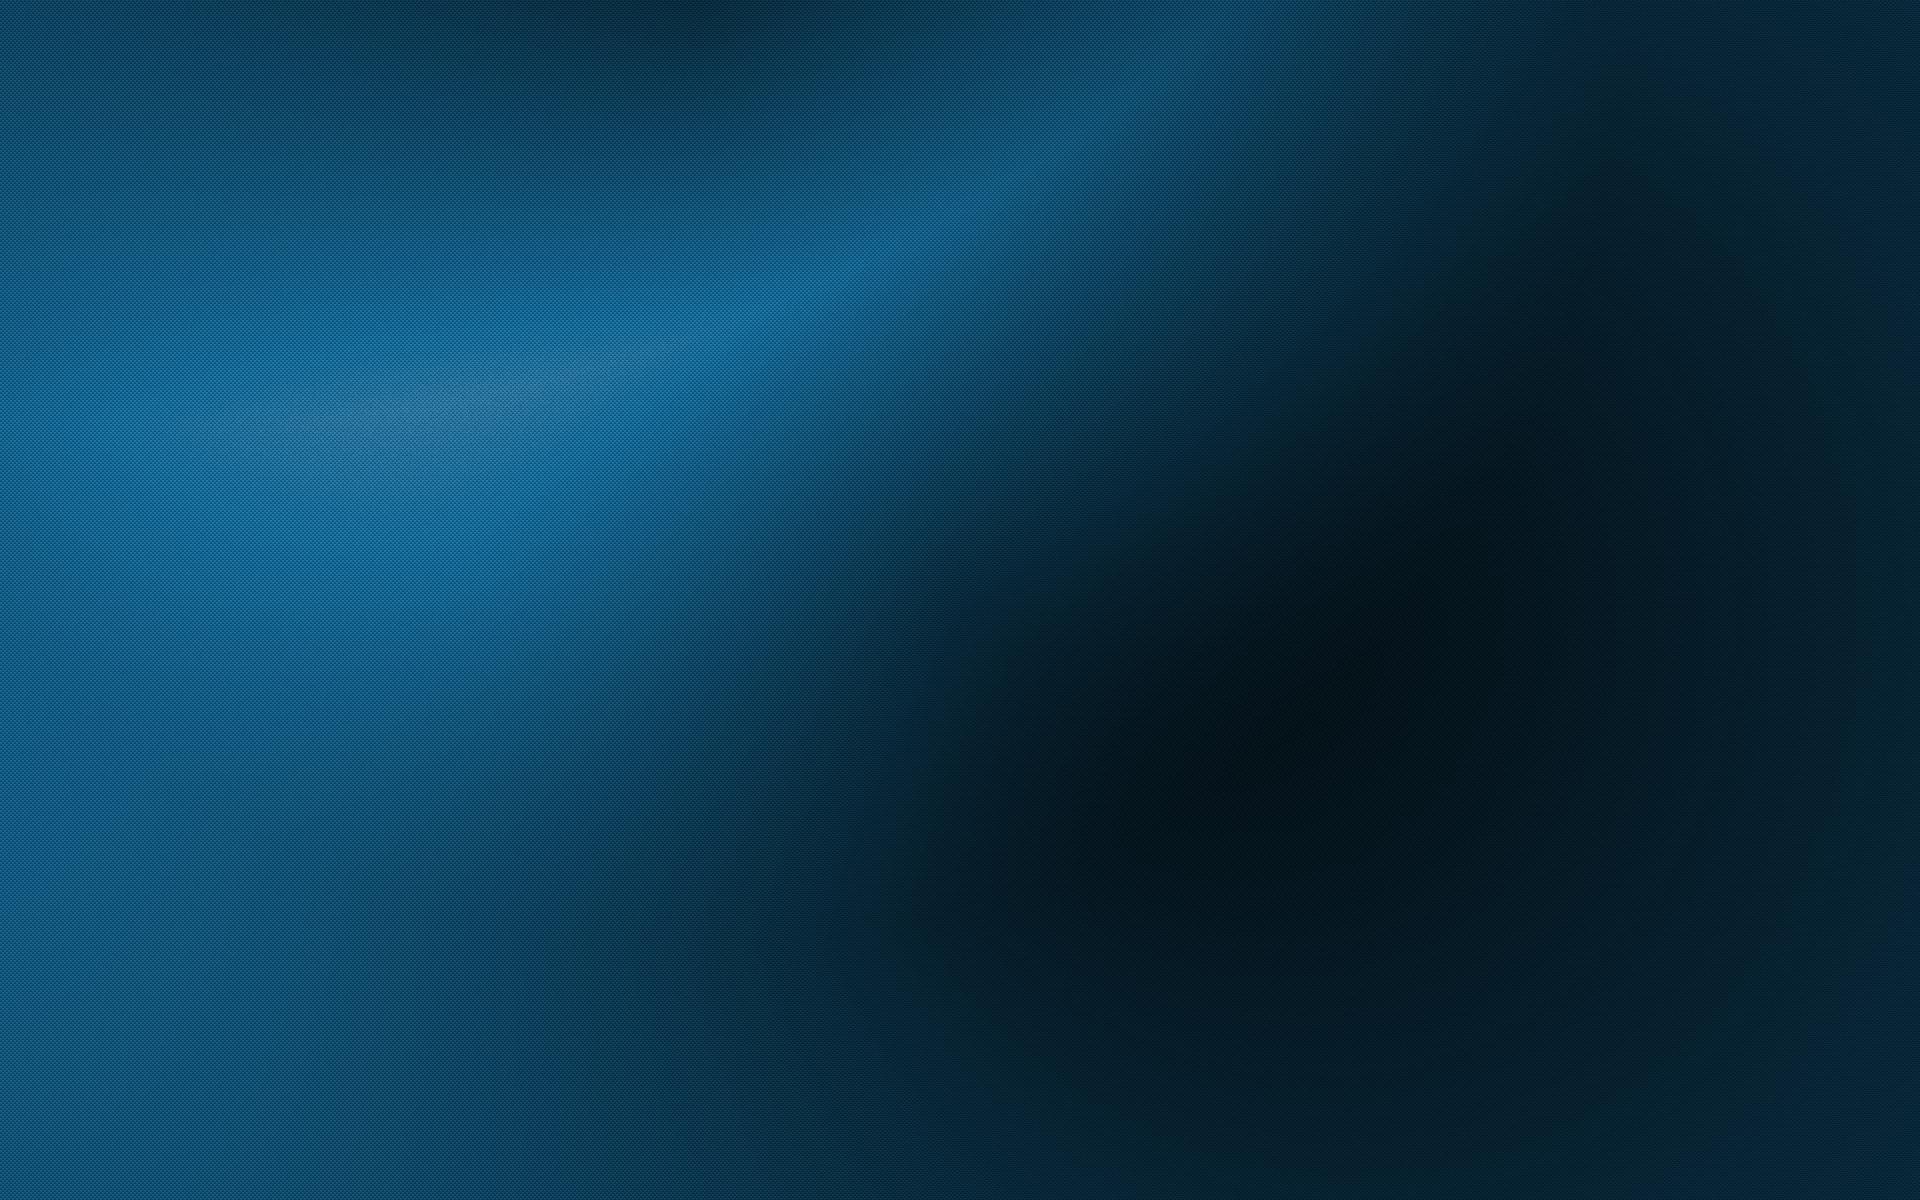 Download desktop wallpaper Beautiful dark blue abstract texture with 1920x1200